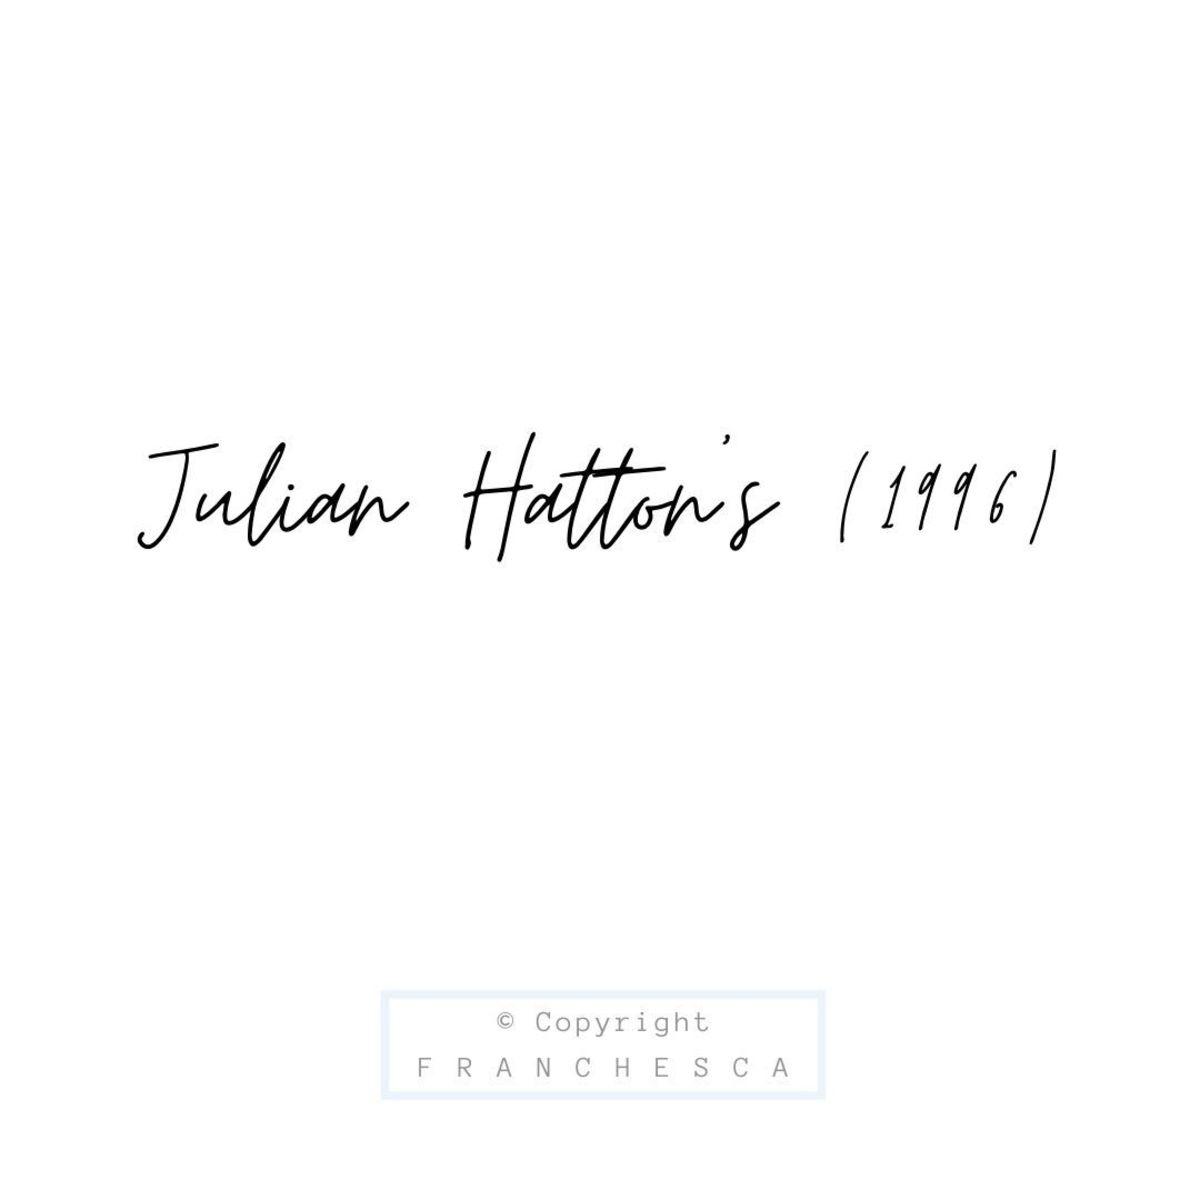 186th Article: Julian Hatton's (1996)